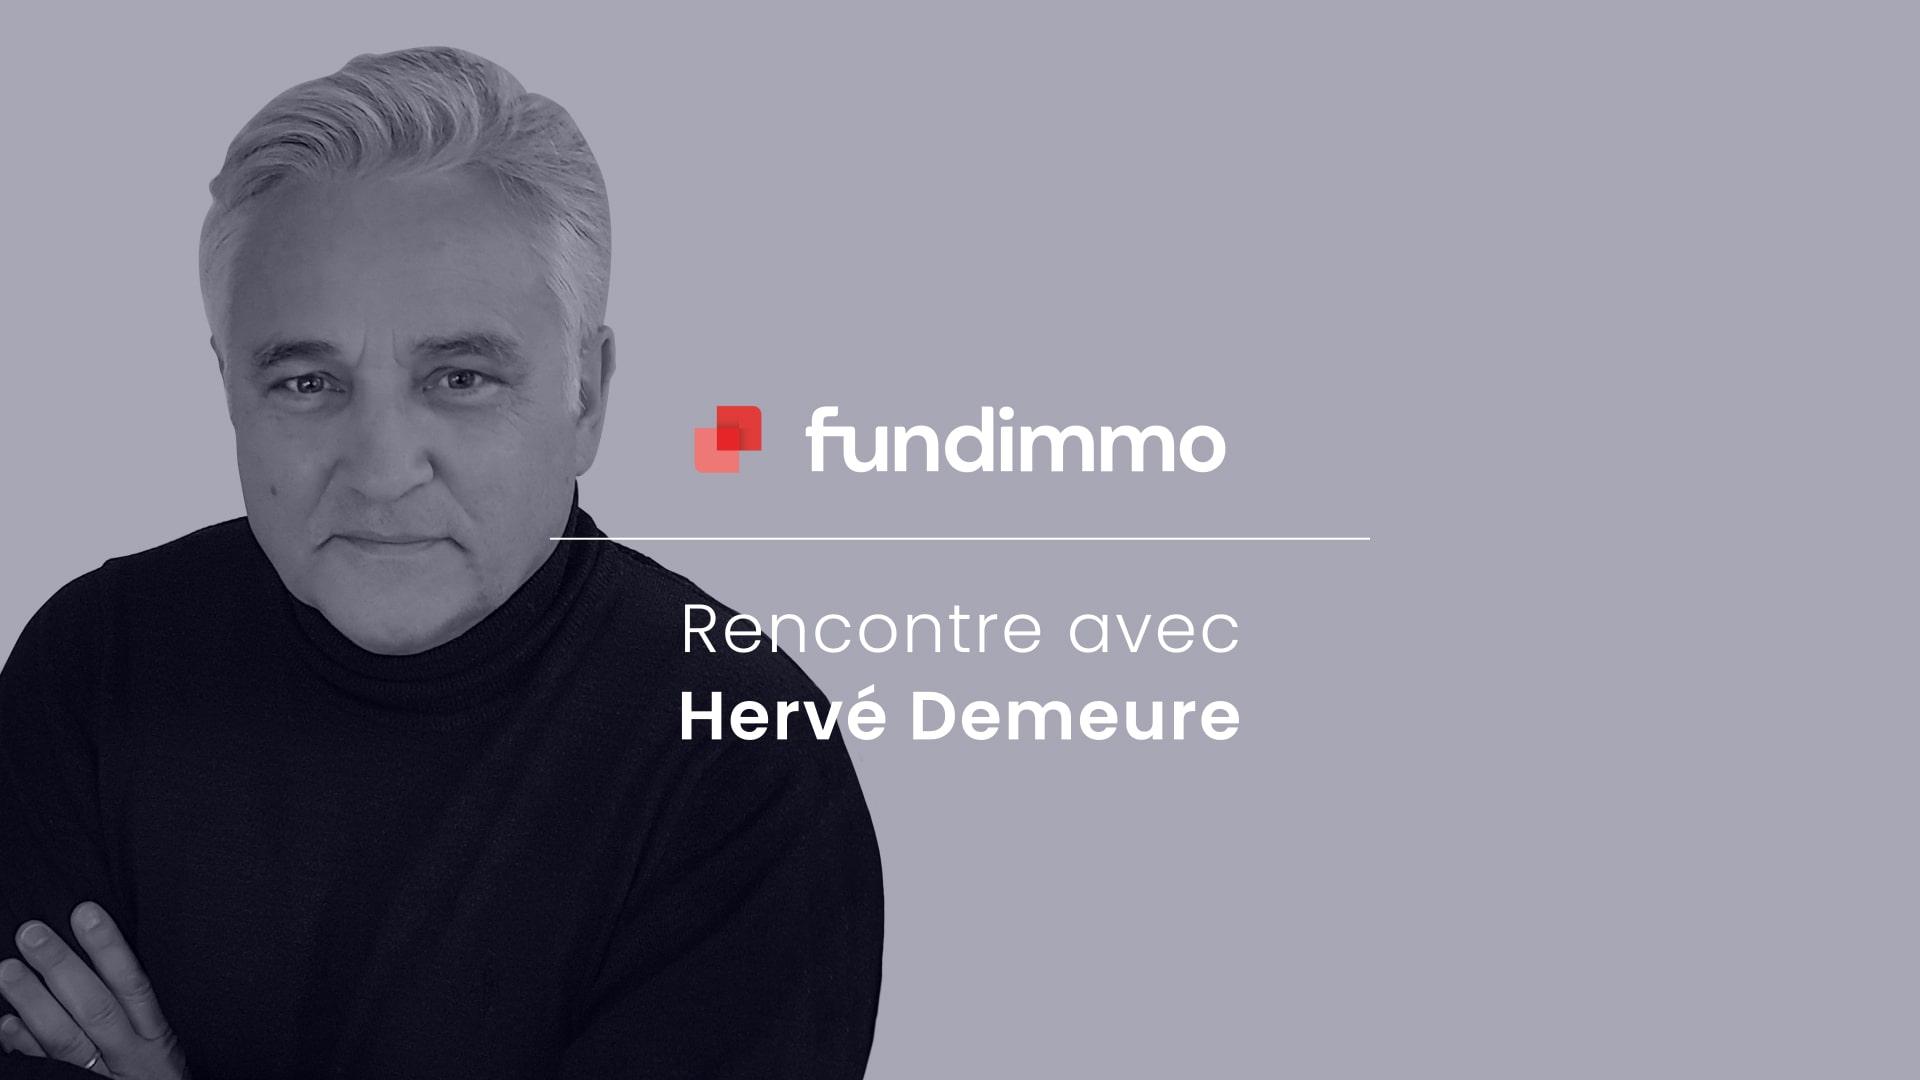 Rencontre avec Hervé Demeure